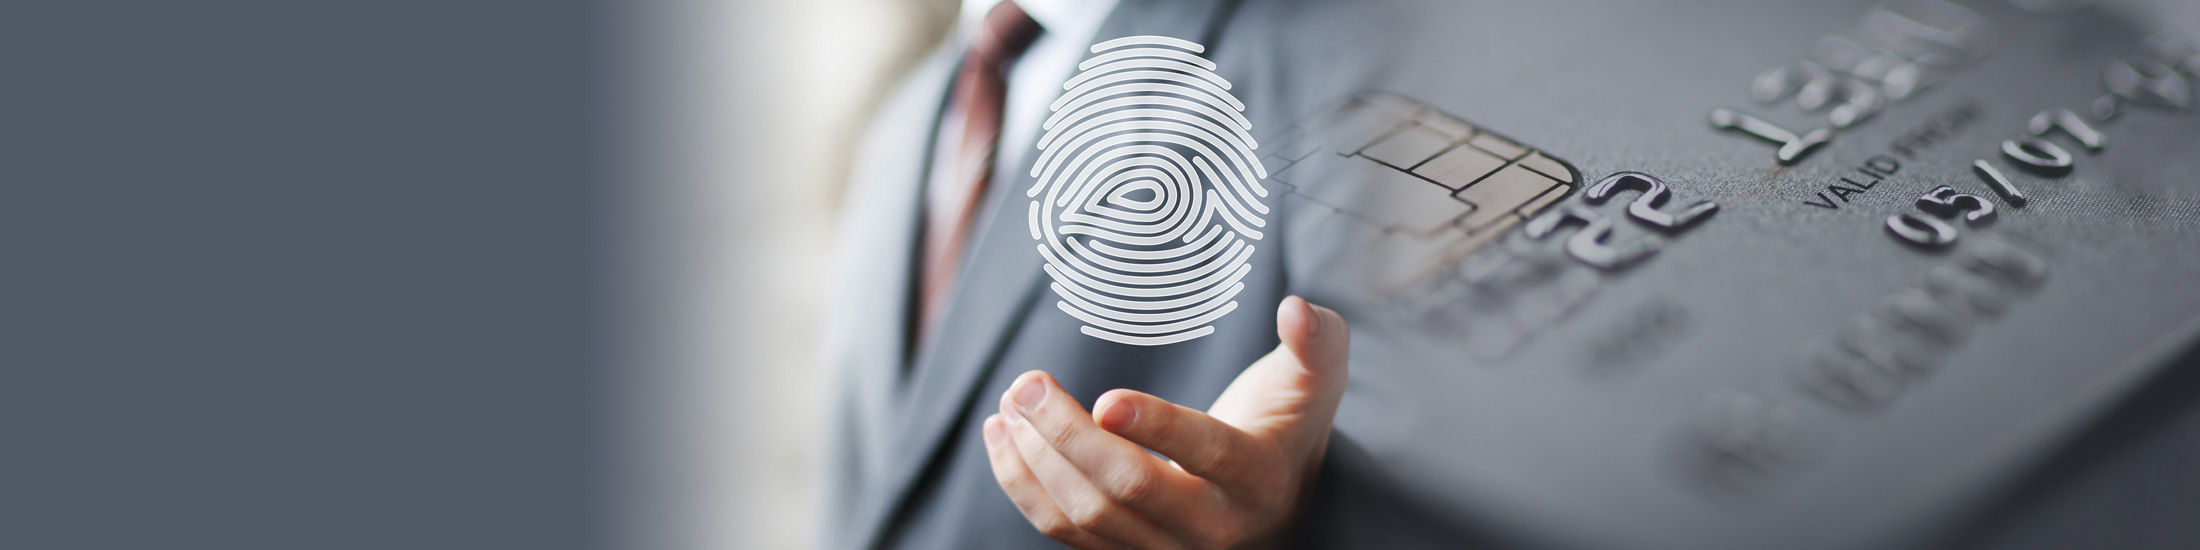 Mastercard Adds ID Verification, Acquires Ekata for $850 Million